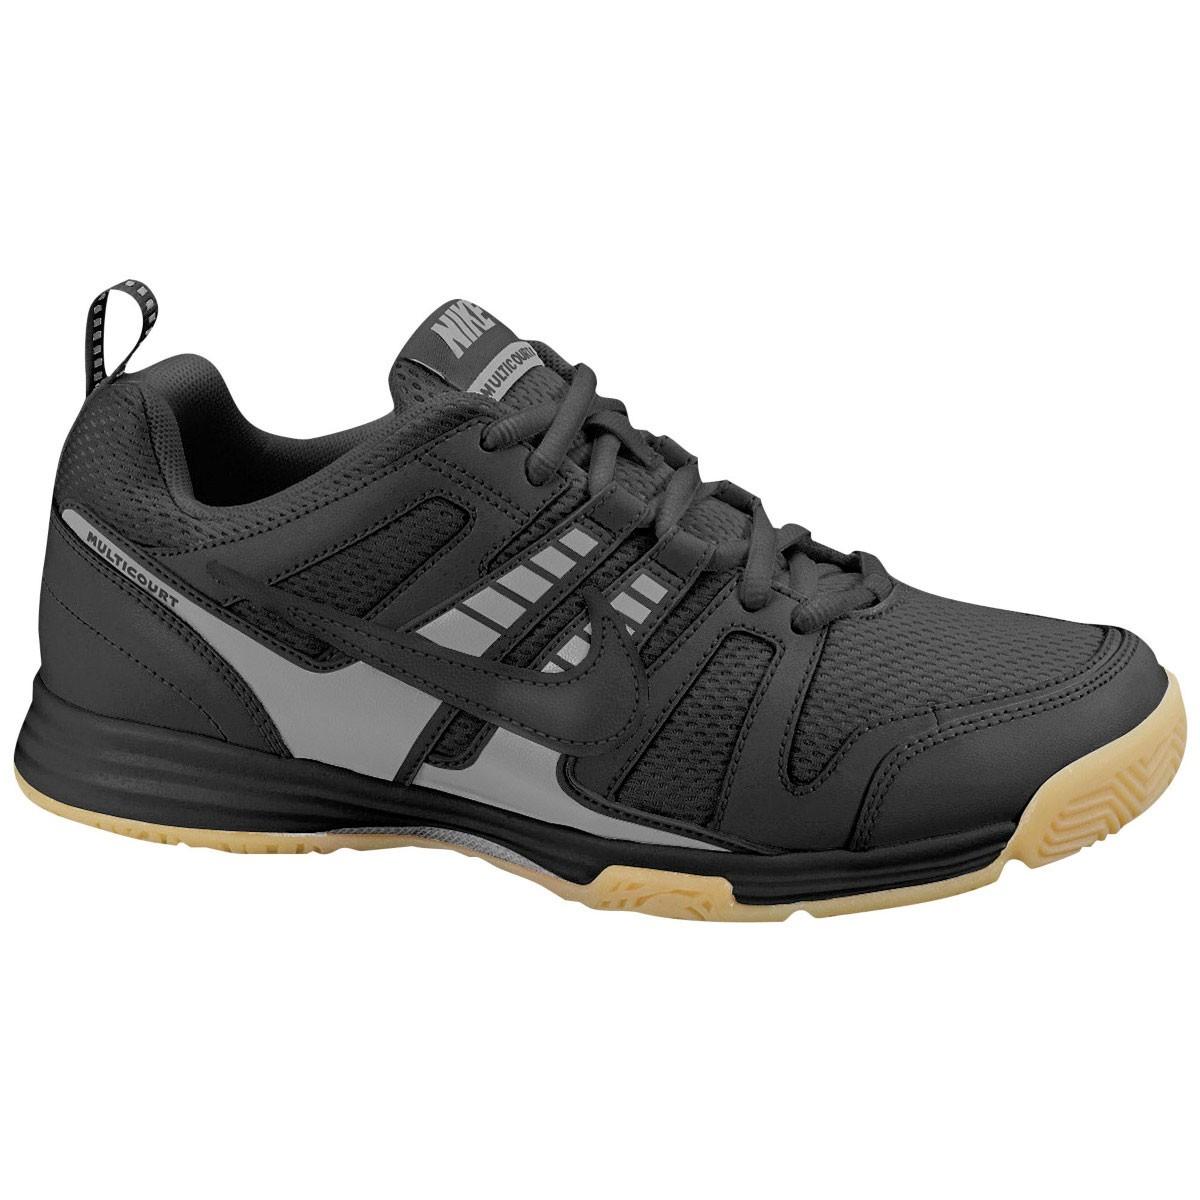 Nike Multicourt Shoes